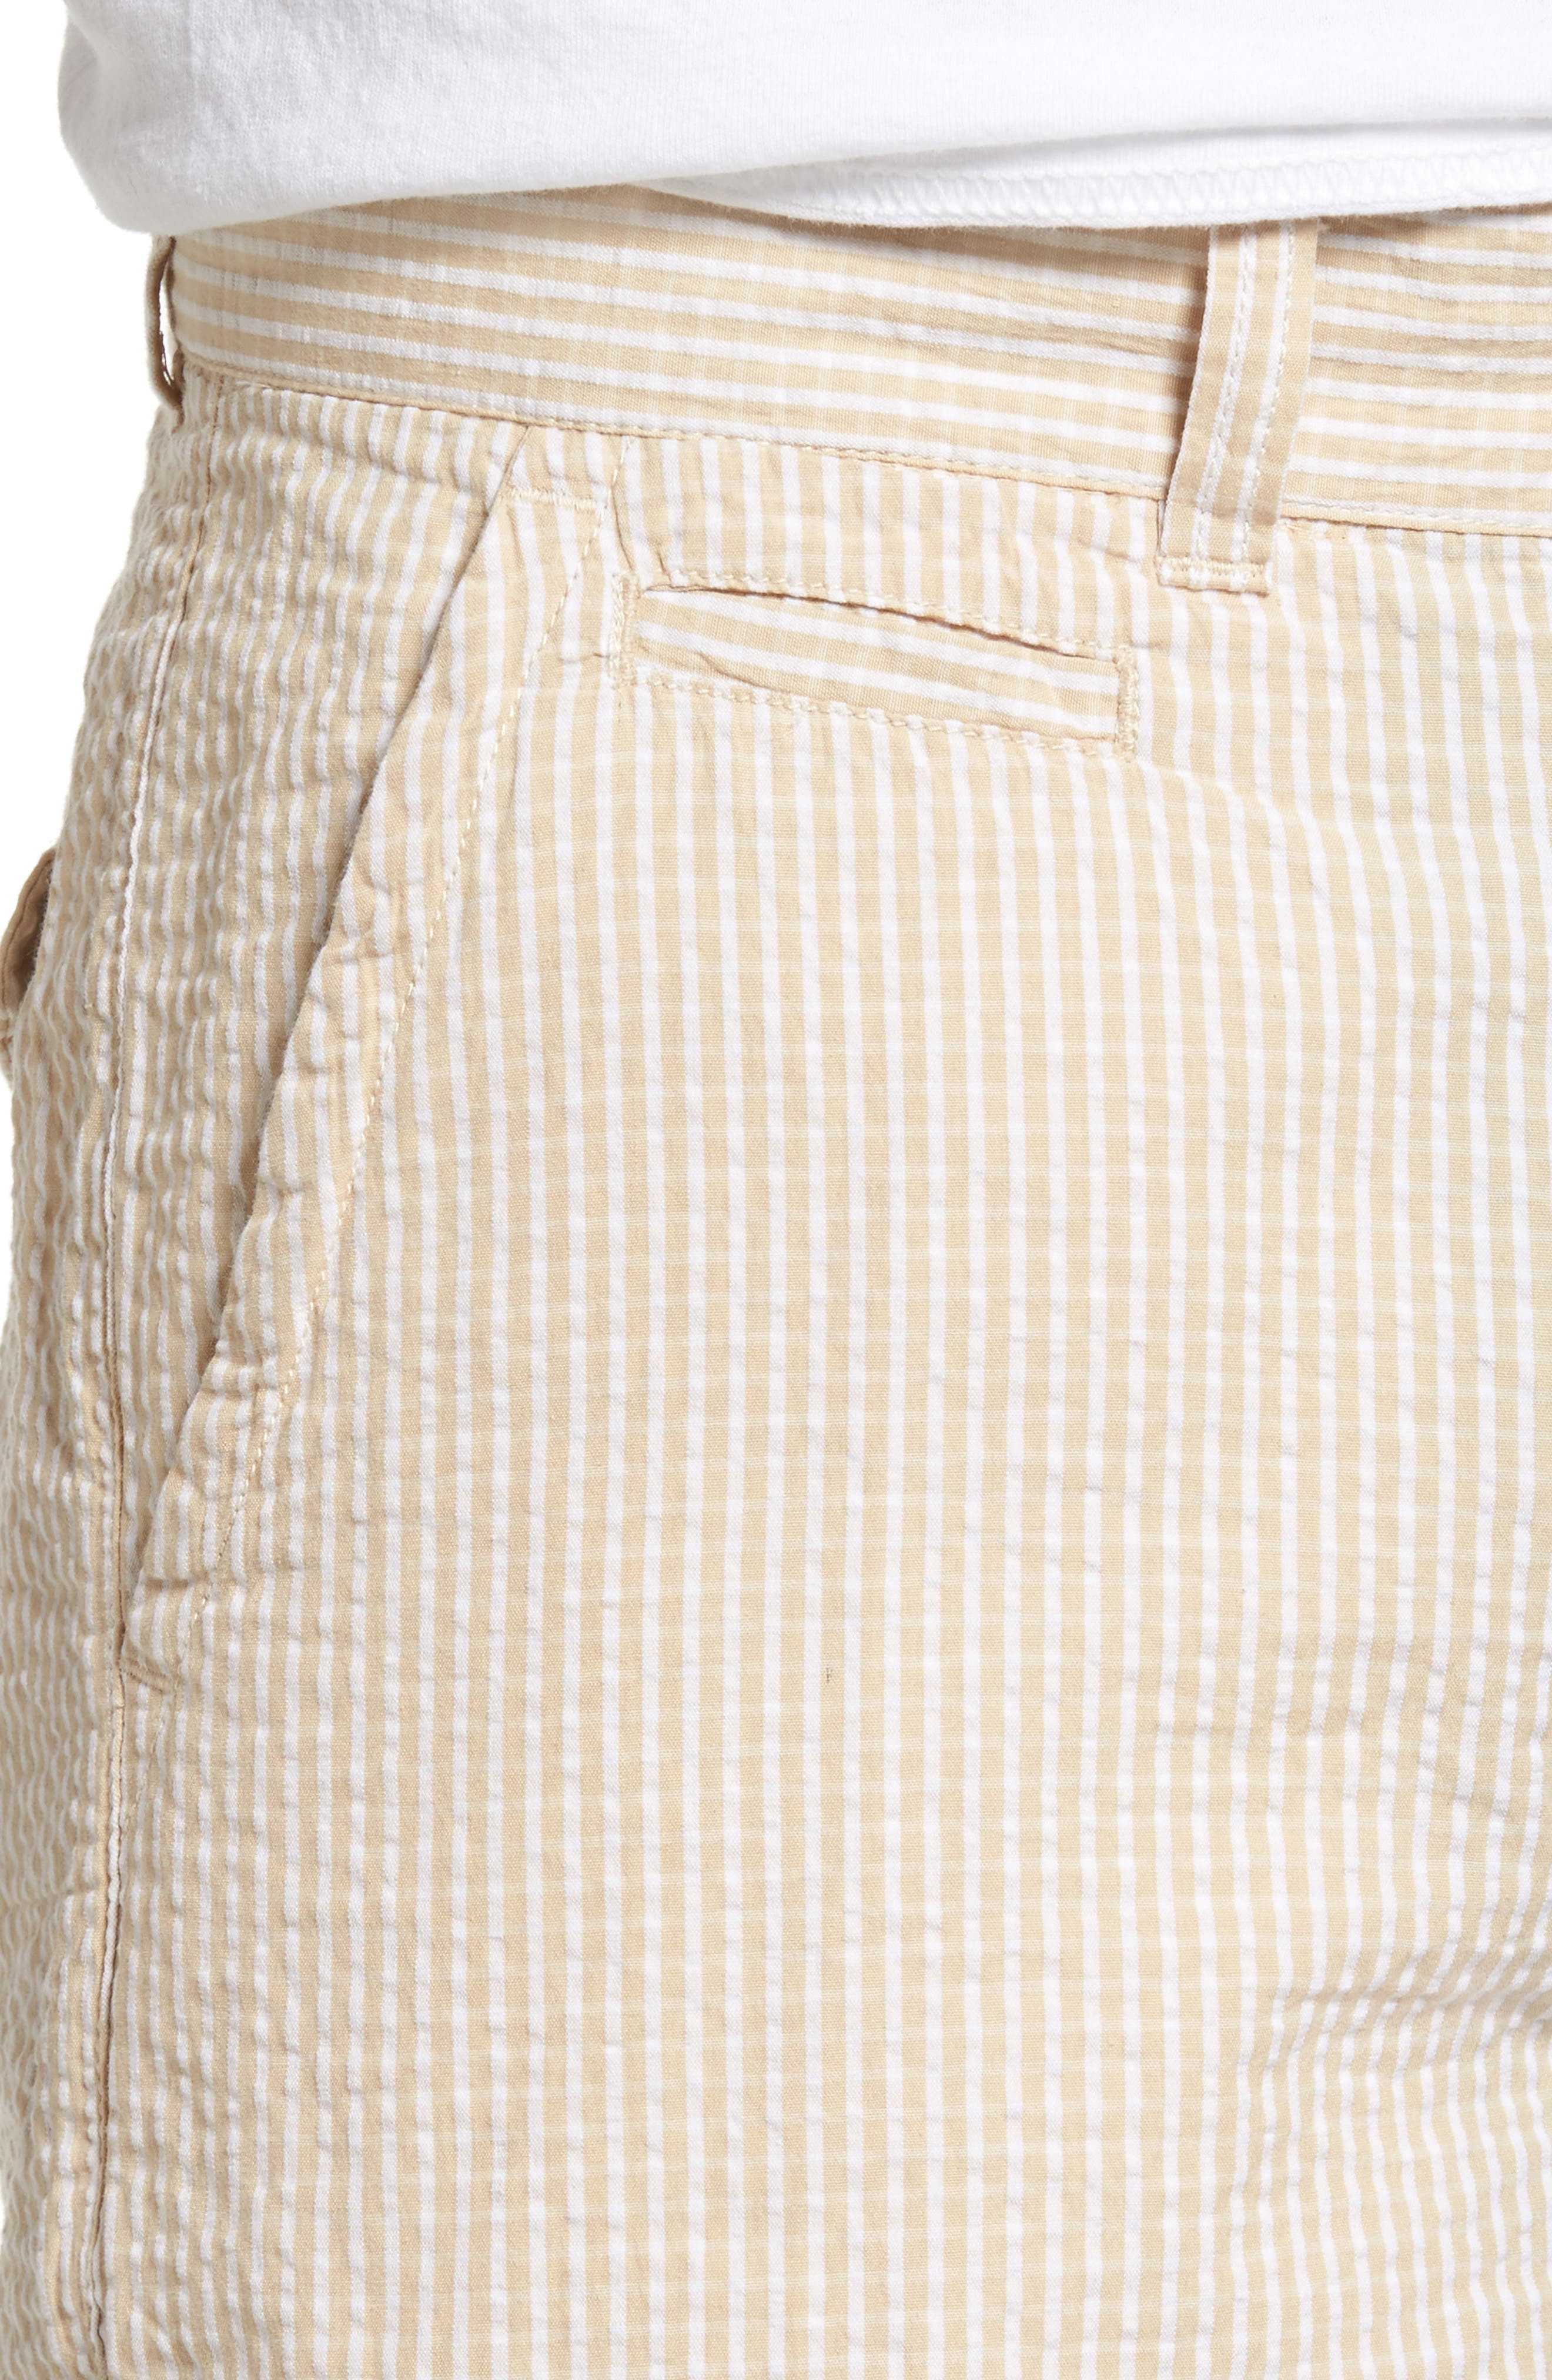 Stripe Seersucker Shorts,                             Alternate thumbnail 4, color,                             Tan